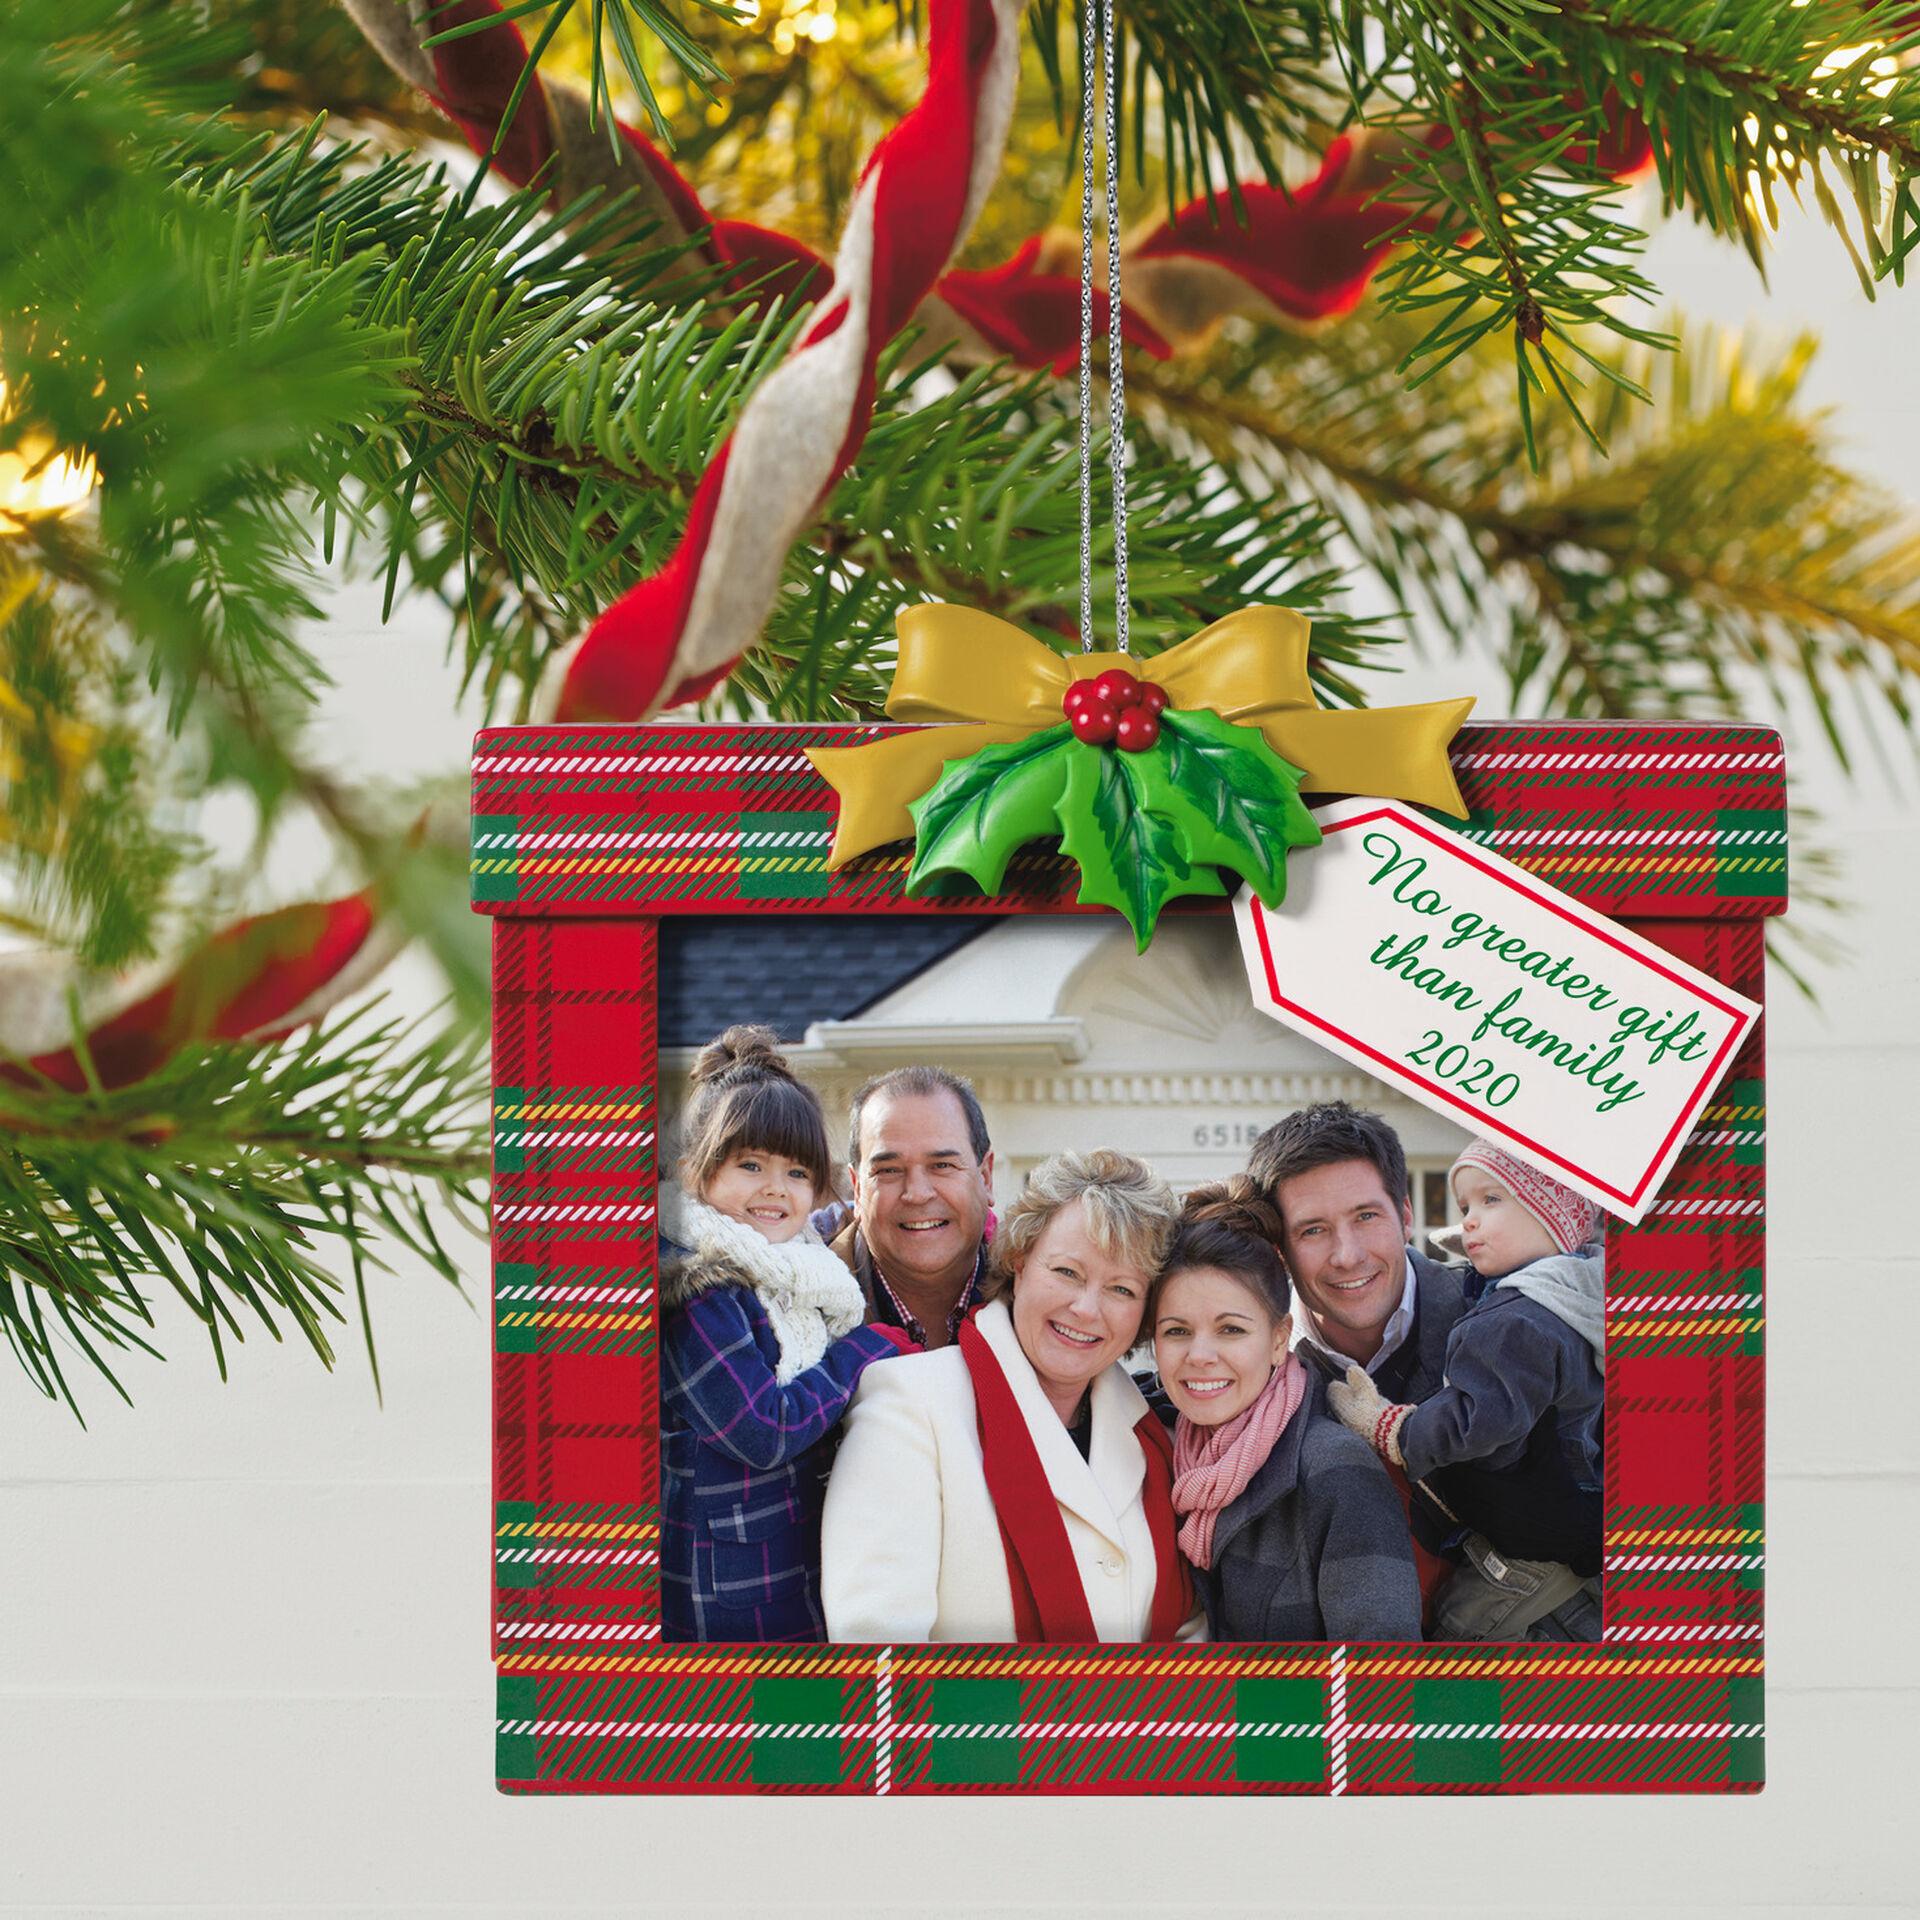 Family's the Greatest Gift 2020 Photo Frame Ornament   Keepsake